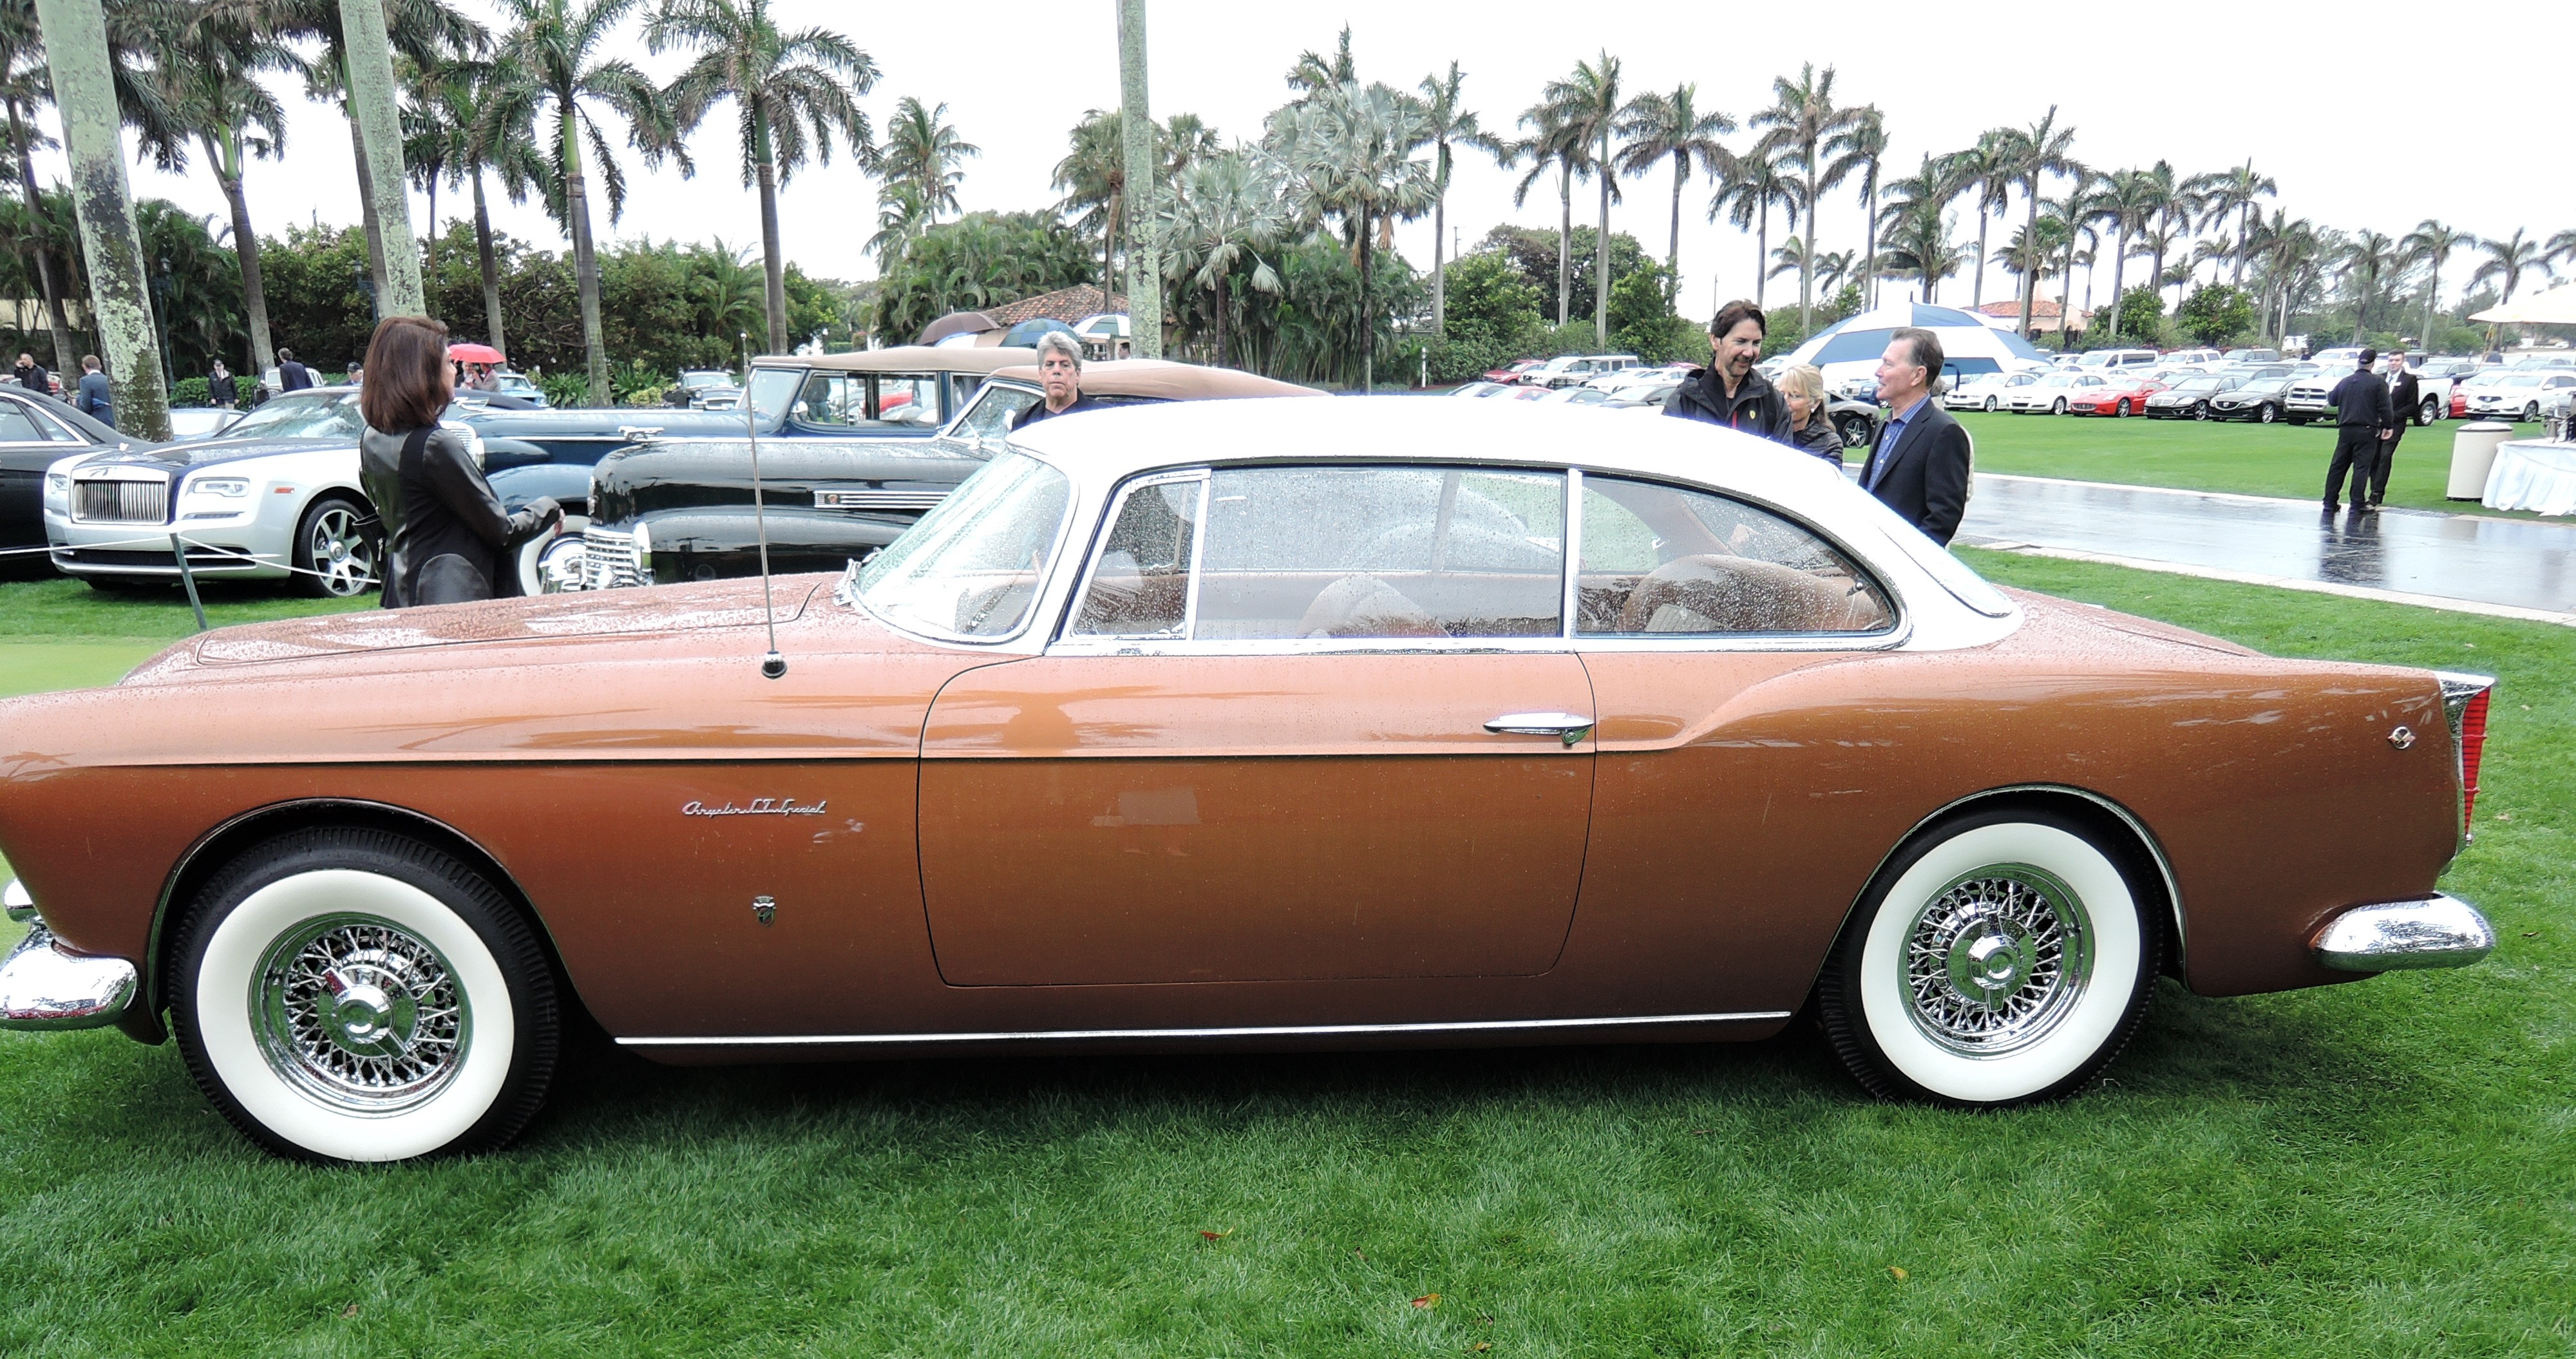 copper 1955 Chrysler Gia ST Special - MaraLago 2017